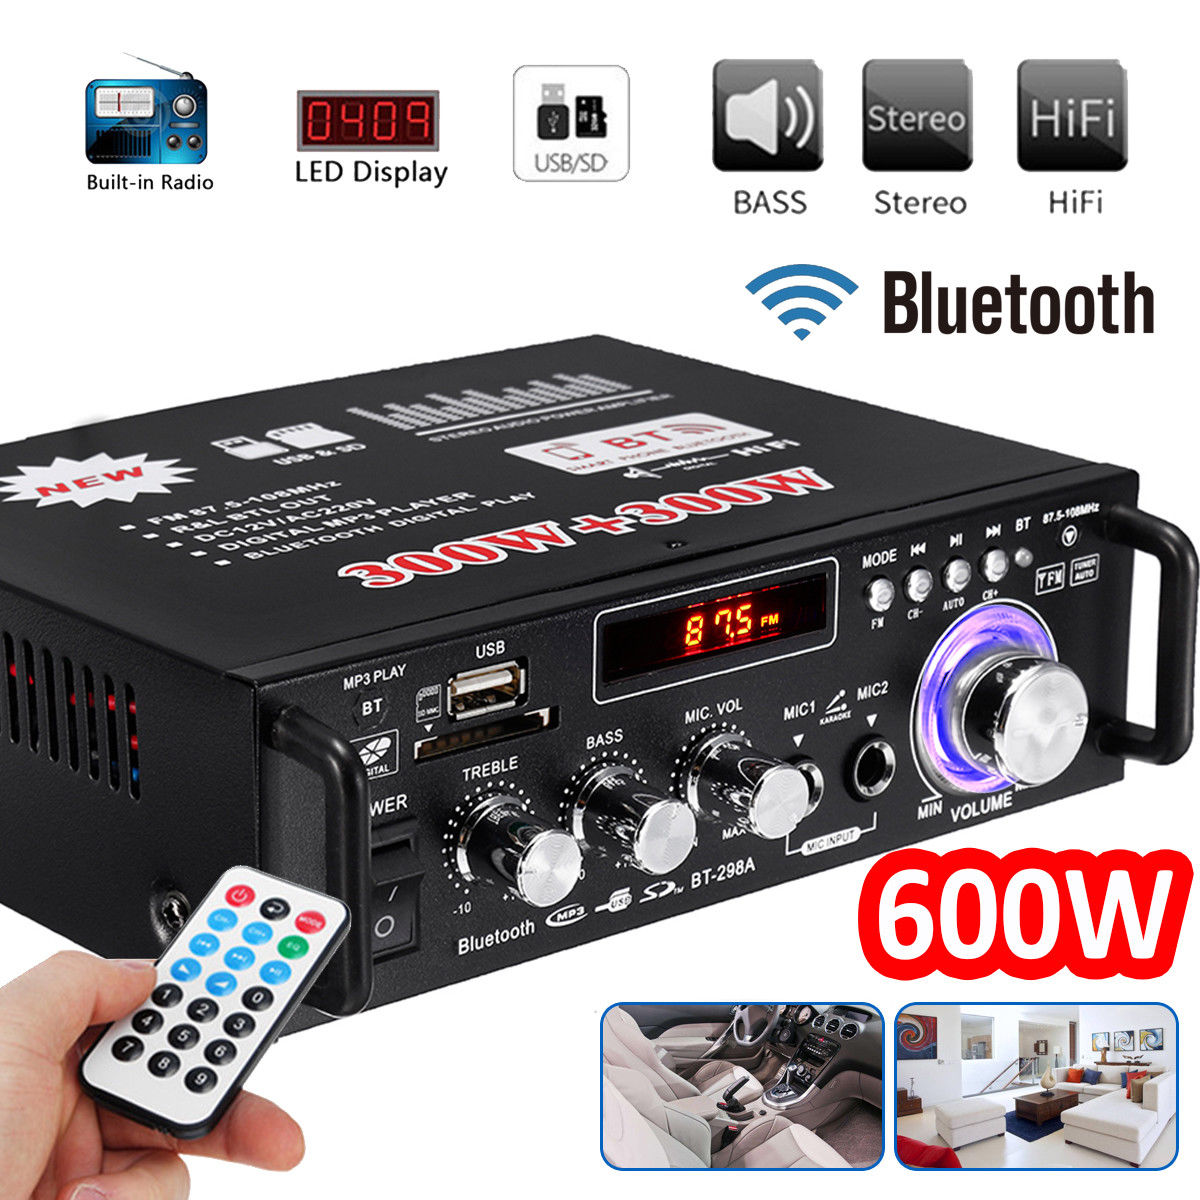 600W Home font b Car b font Amplifier 110V HIFI USB FM font b Radio b